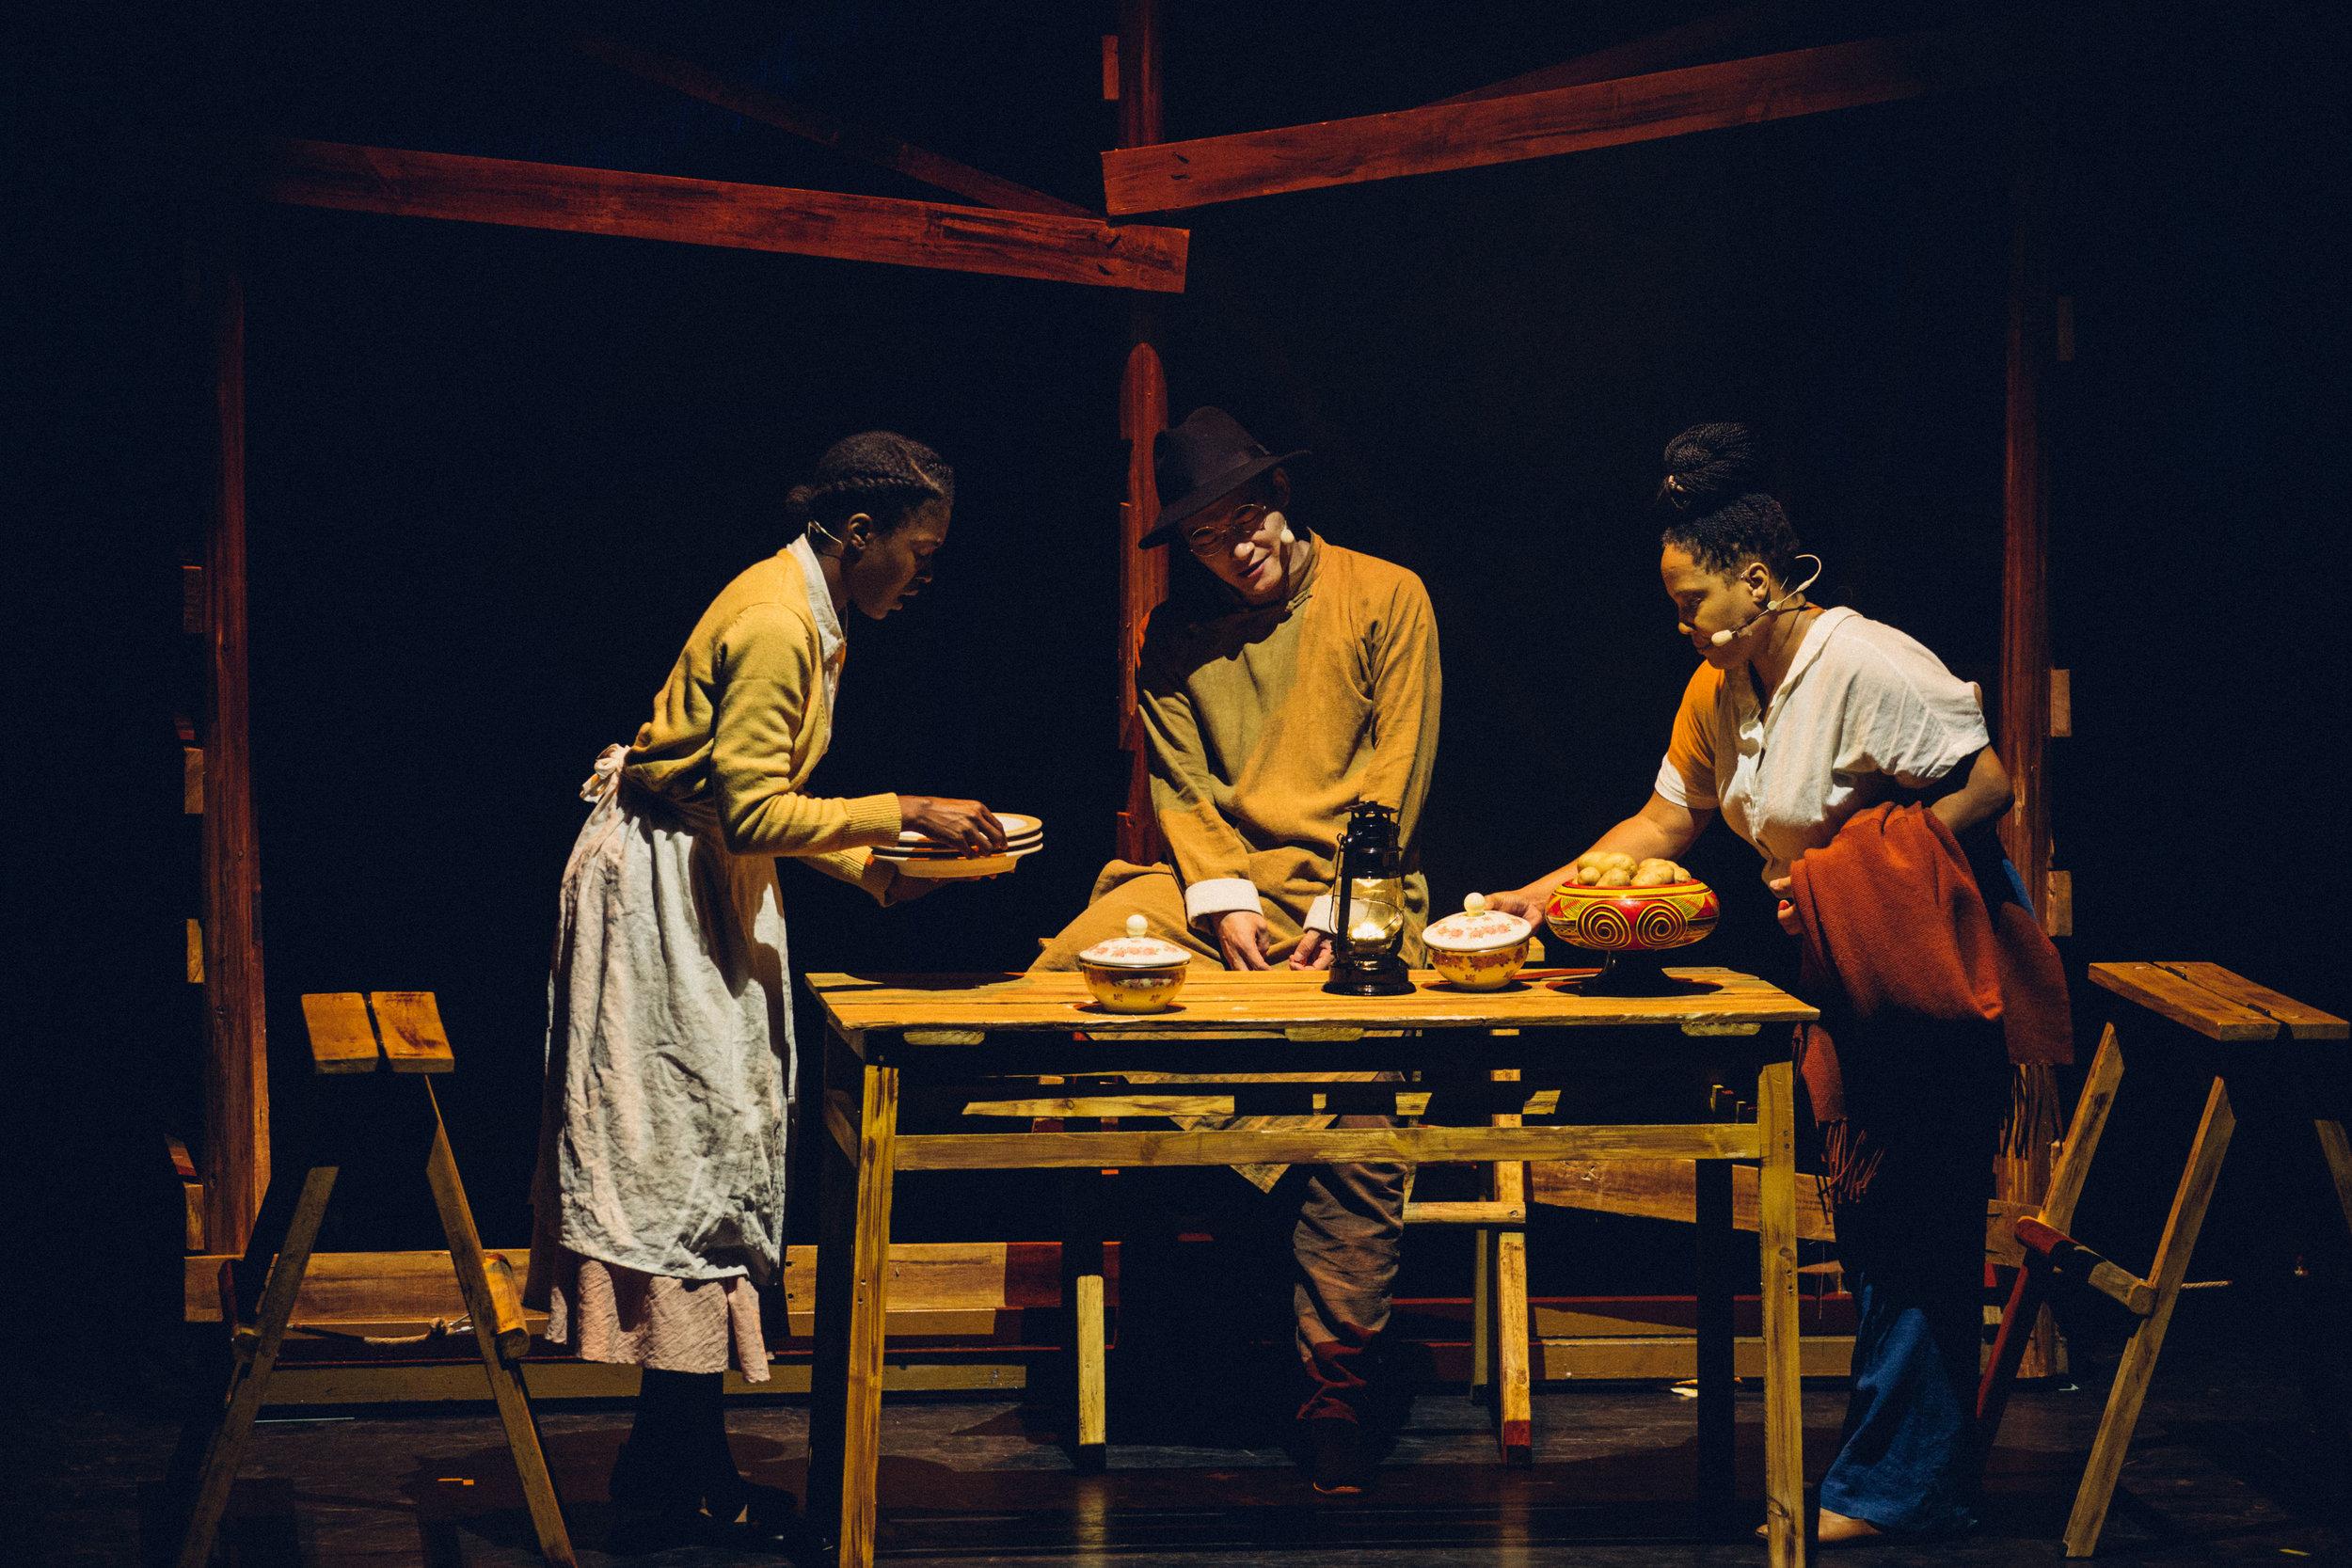 Left to right: Erin Pettigrew, Zhu Tiantian, and Karma Mayet Johnson.